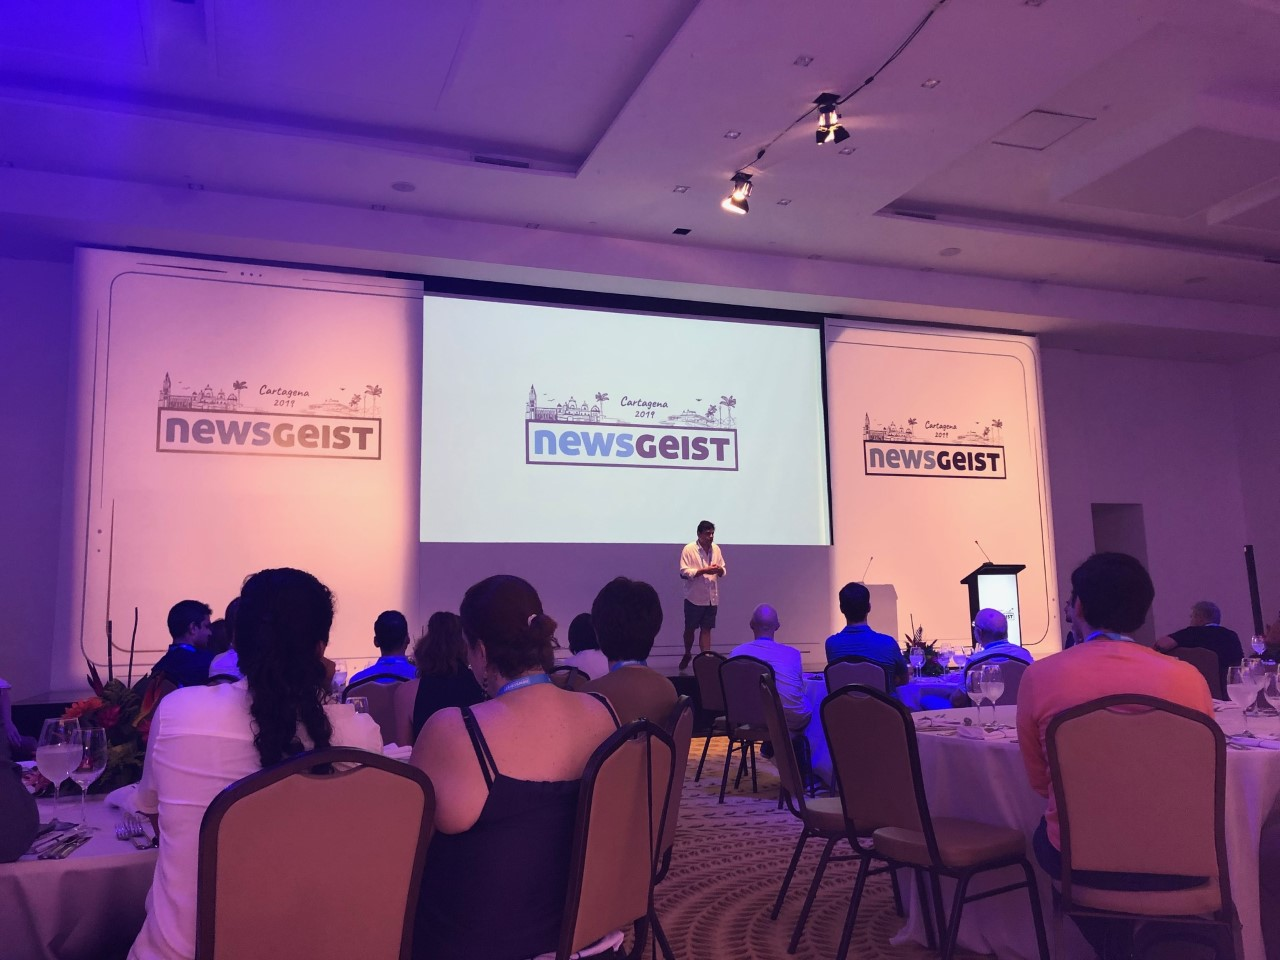 newsgeist